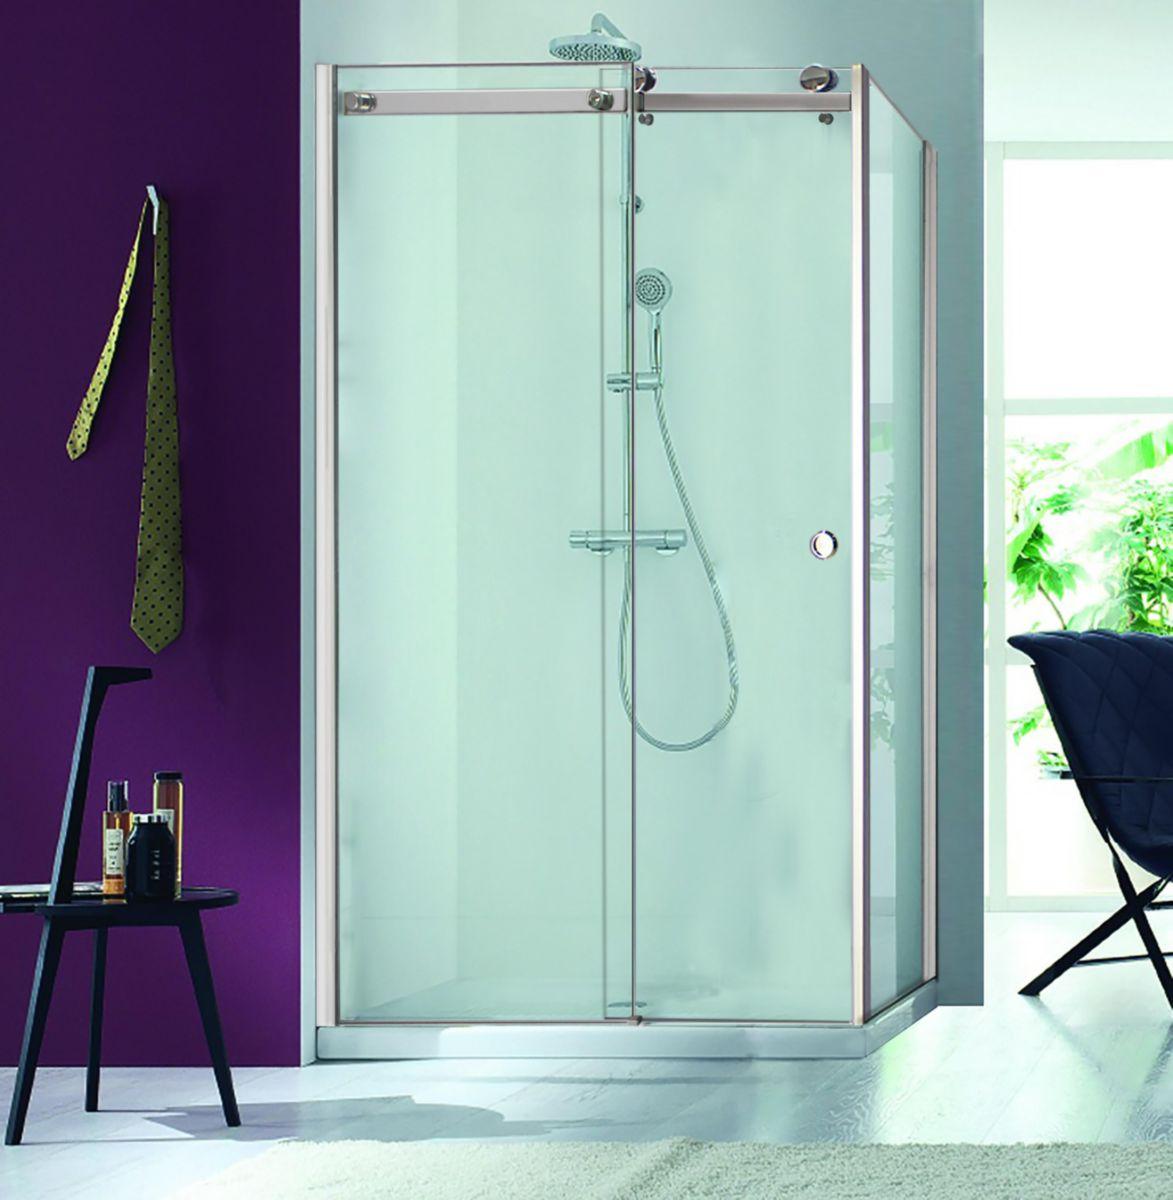 alterna paroi de douche retour design 80 cm cedeo. Black Bedroom Furniture Sets. Home Design Ideas